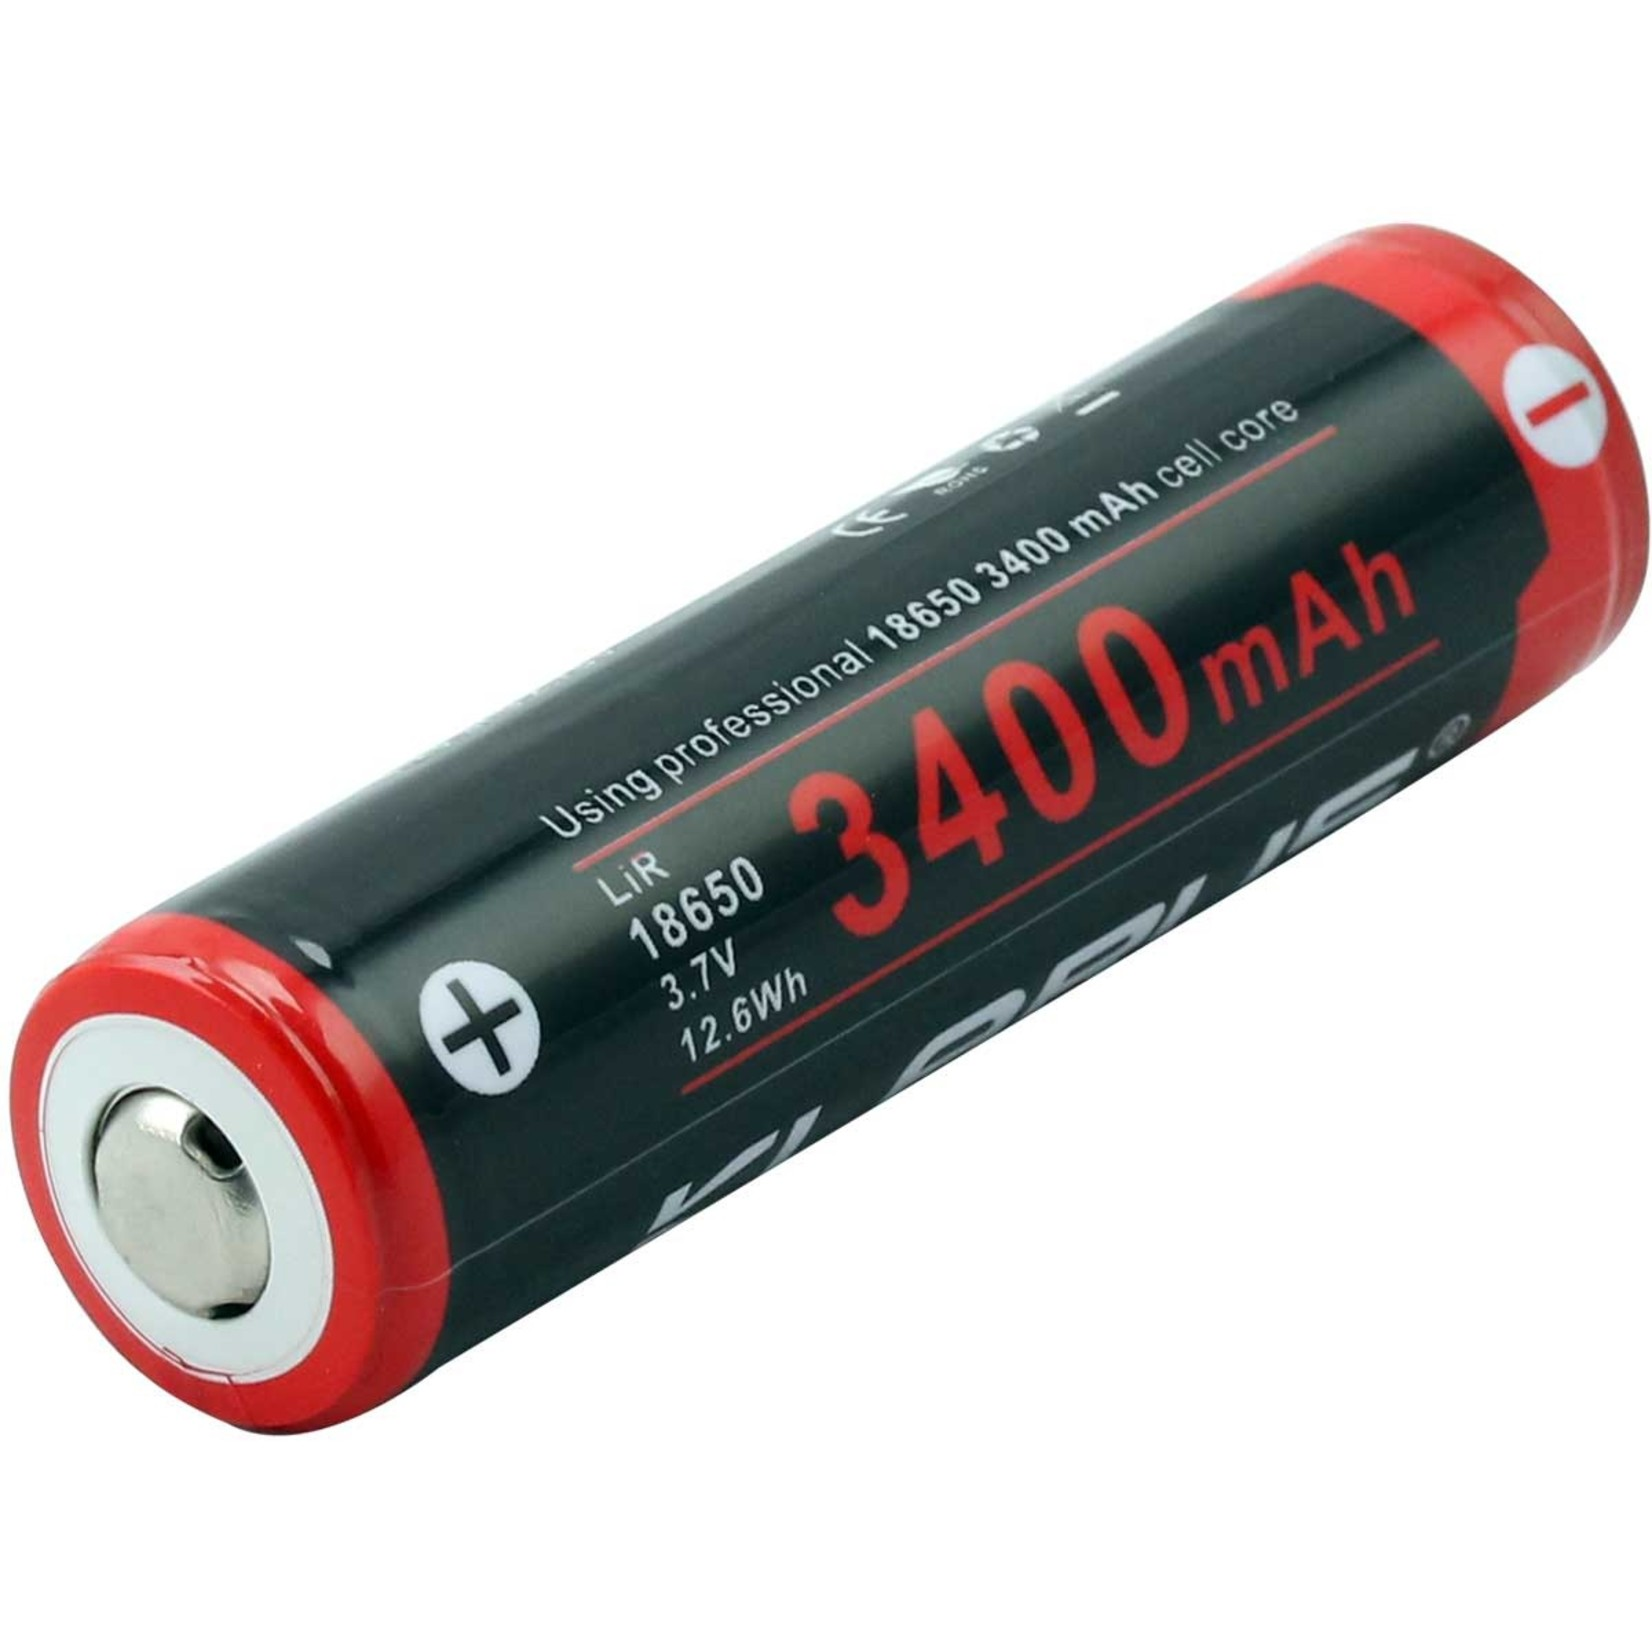 Klarus Klarus 18650 3400MAh-3.7V Li-on Battery